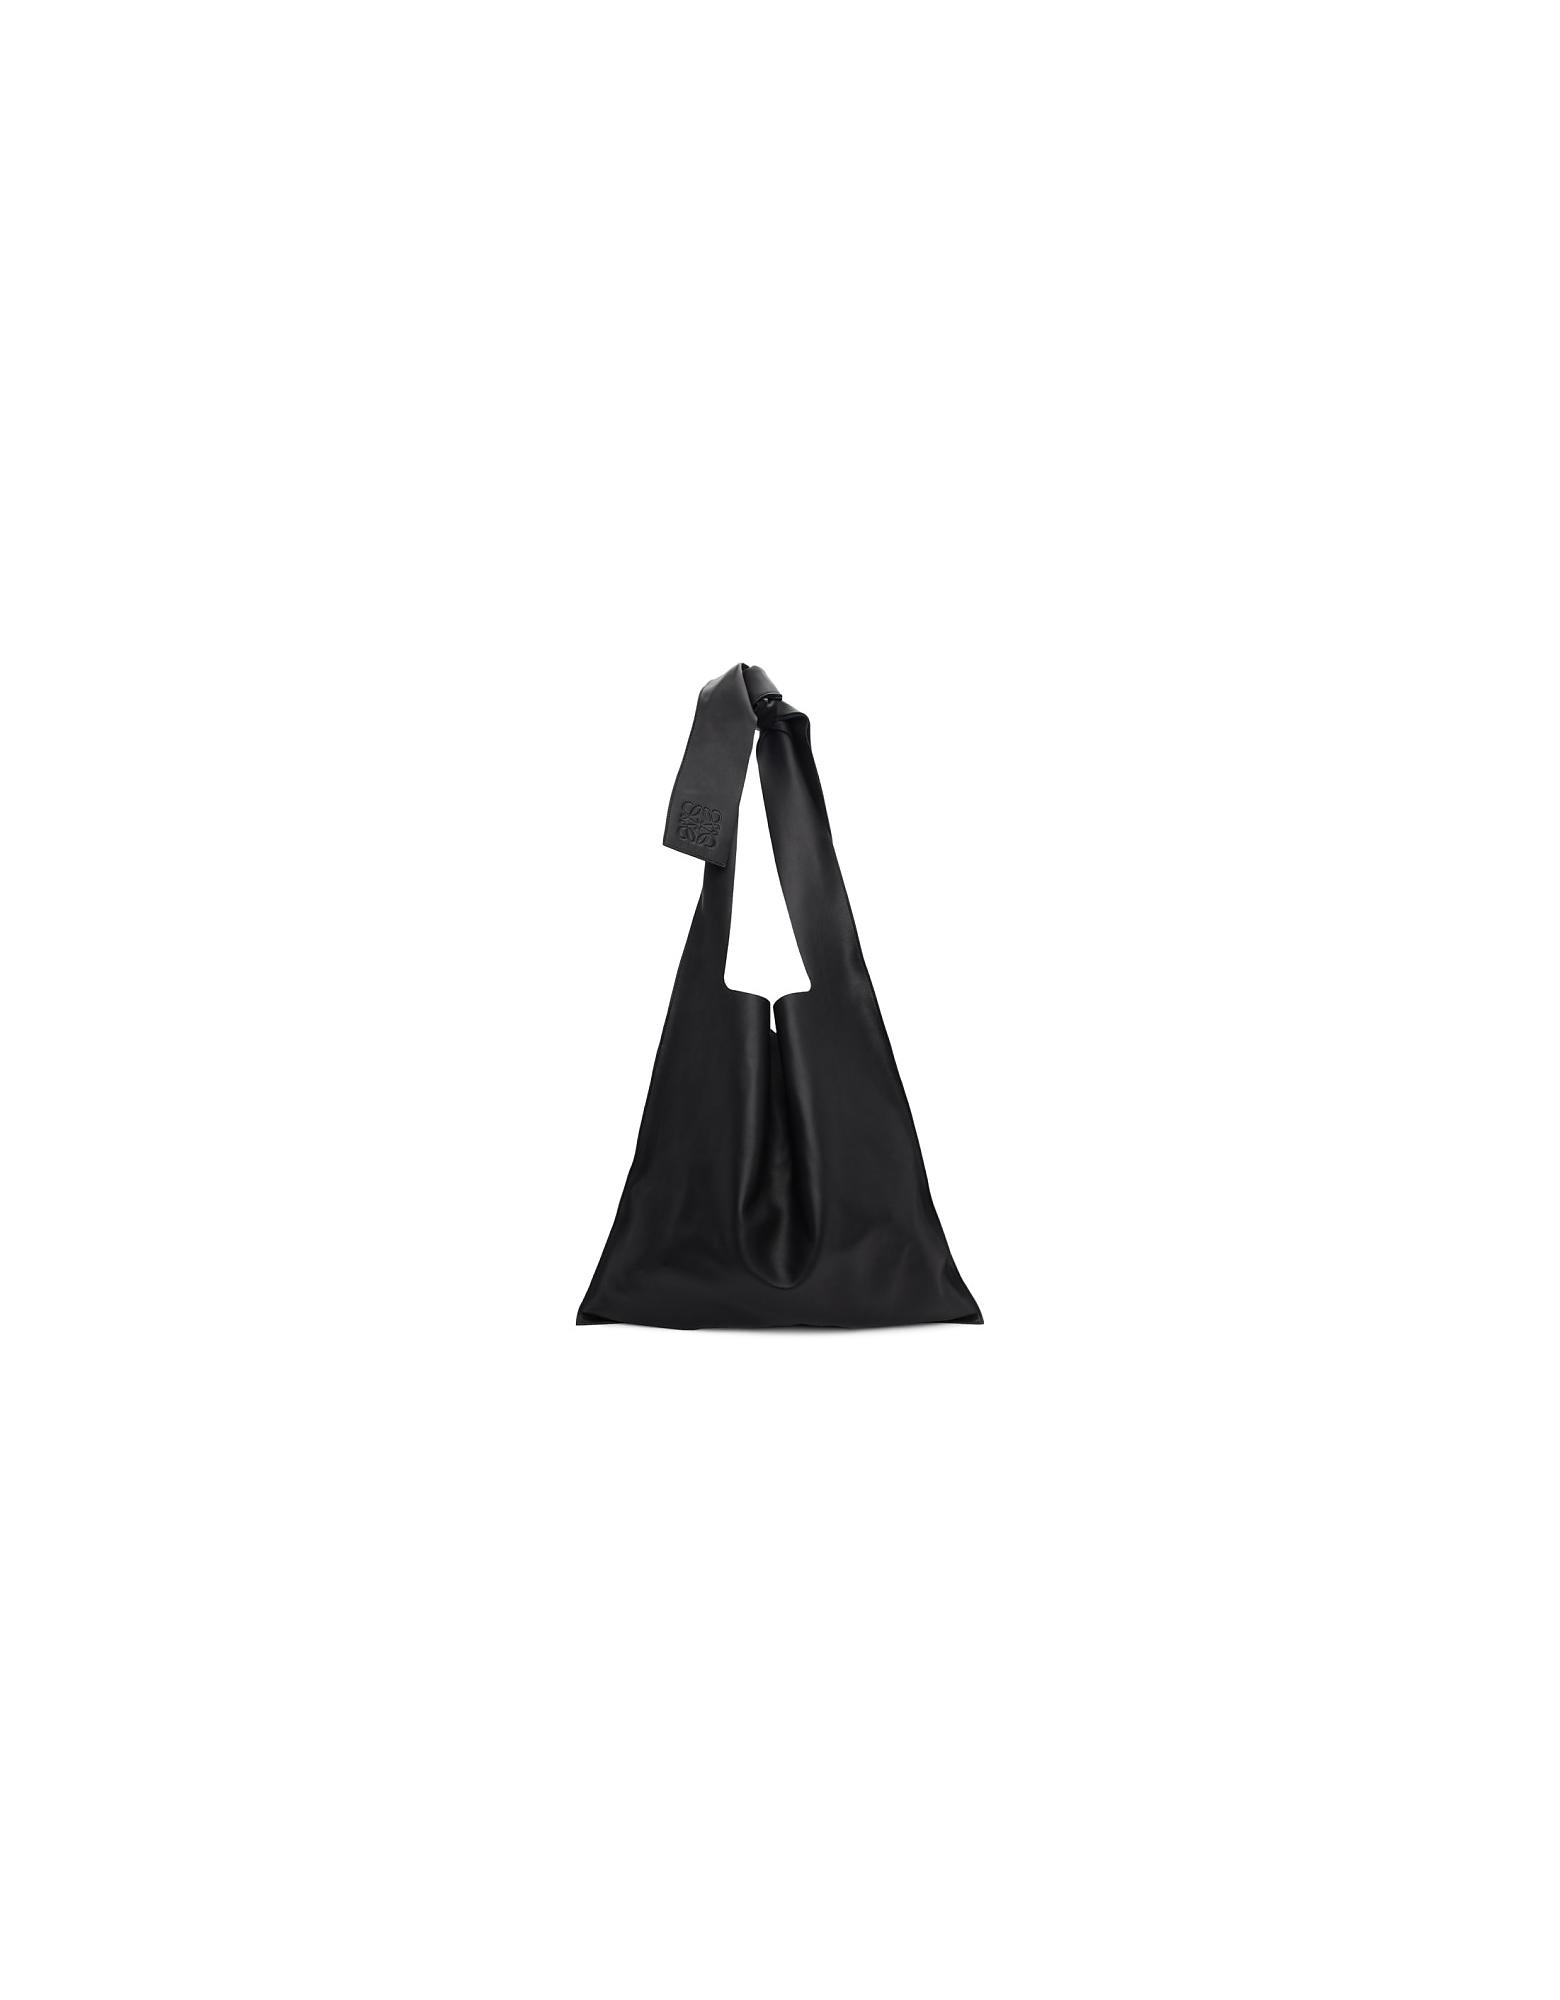 Loewe Designer Handbags, Black Leather Bow Tote